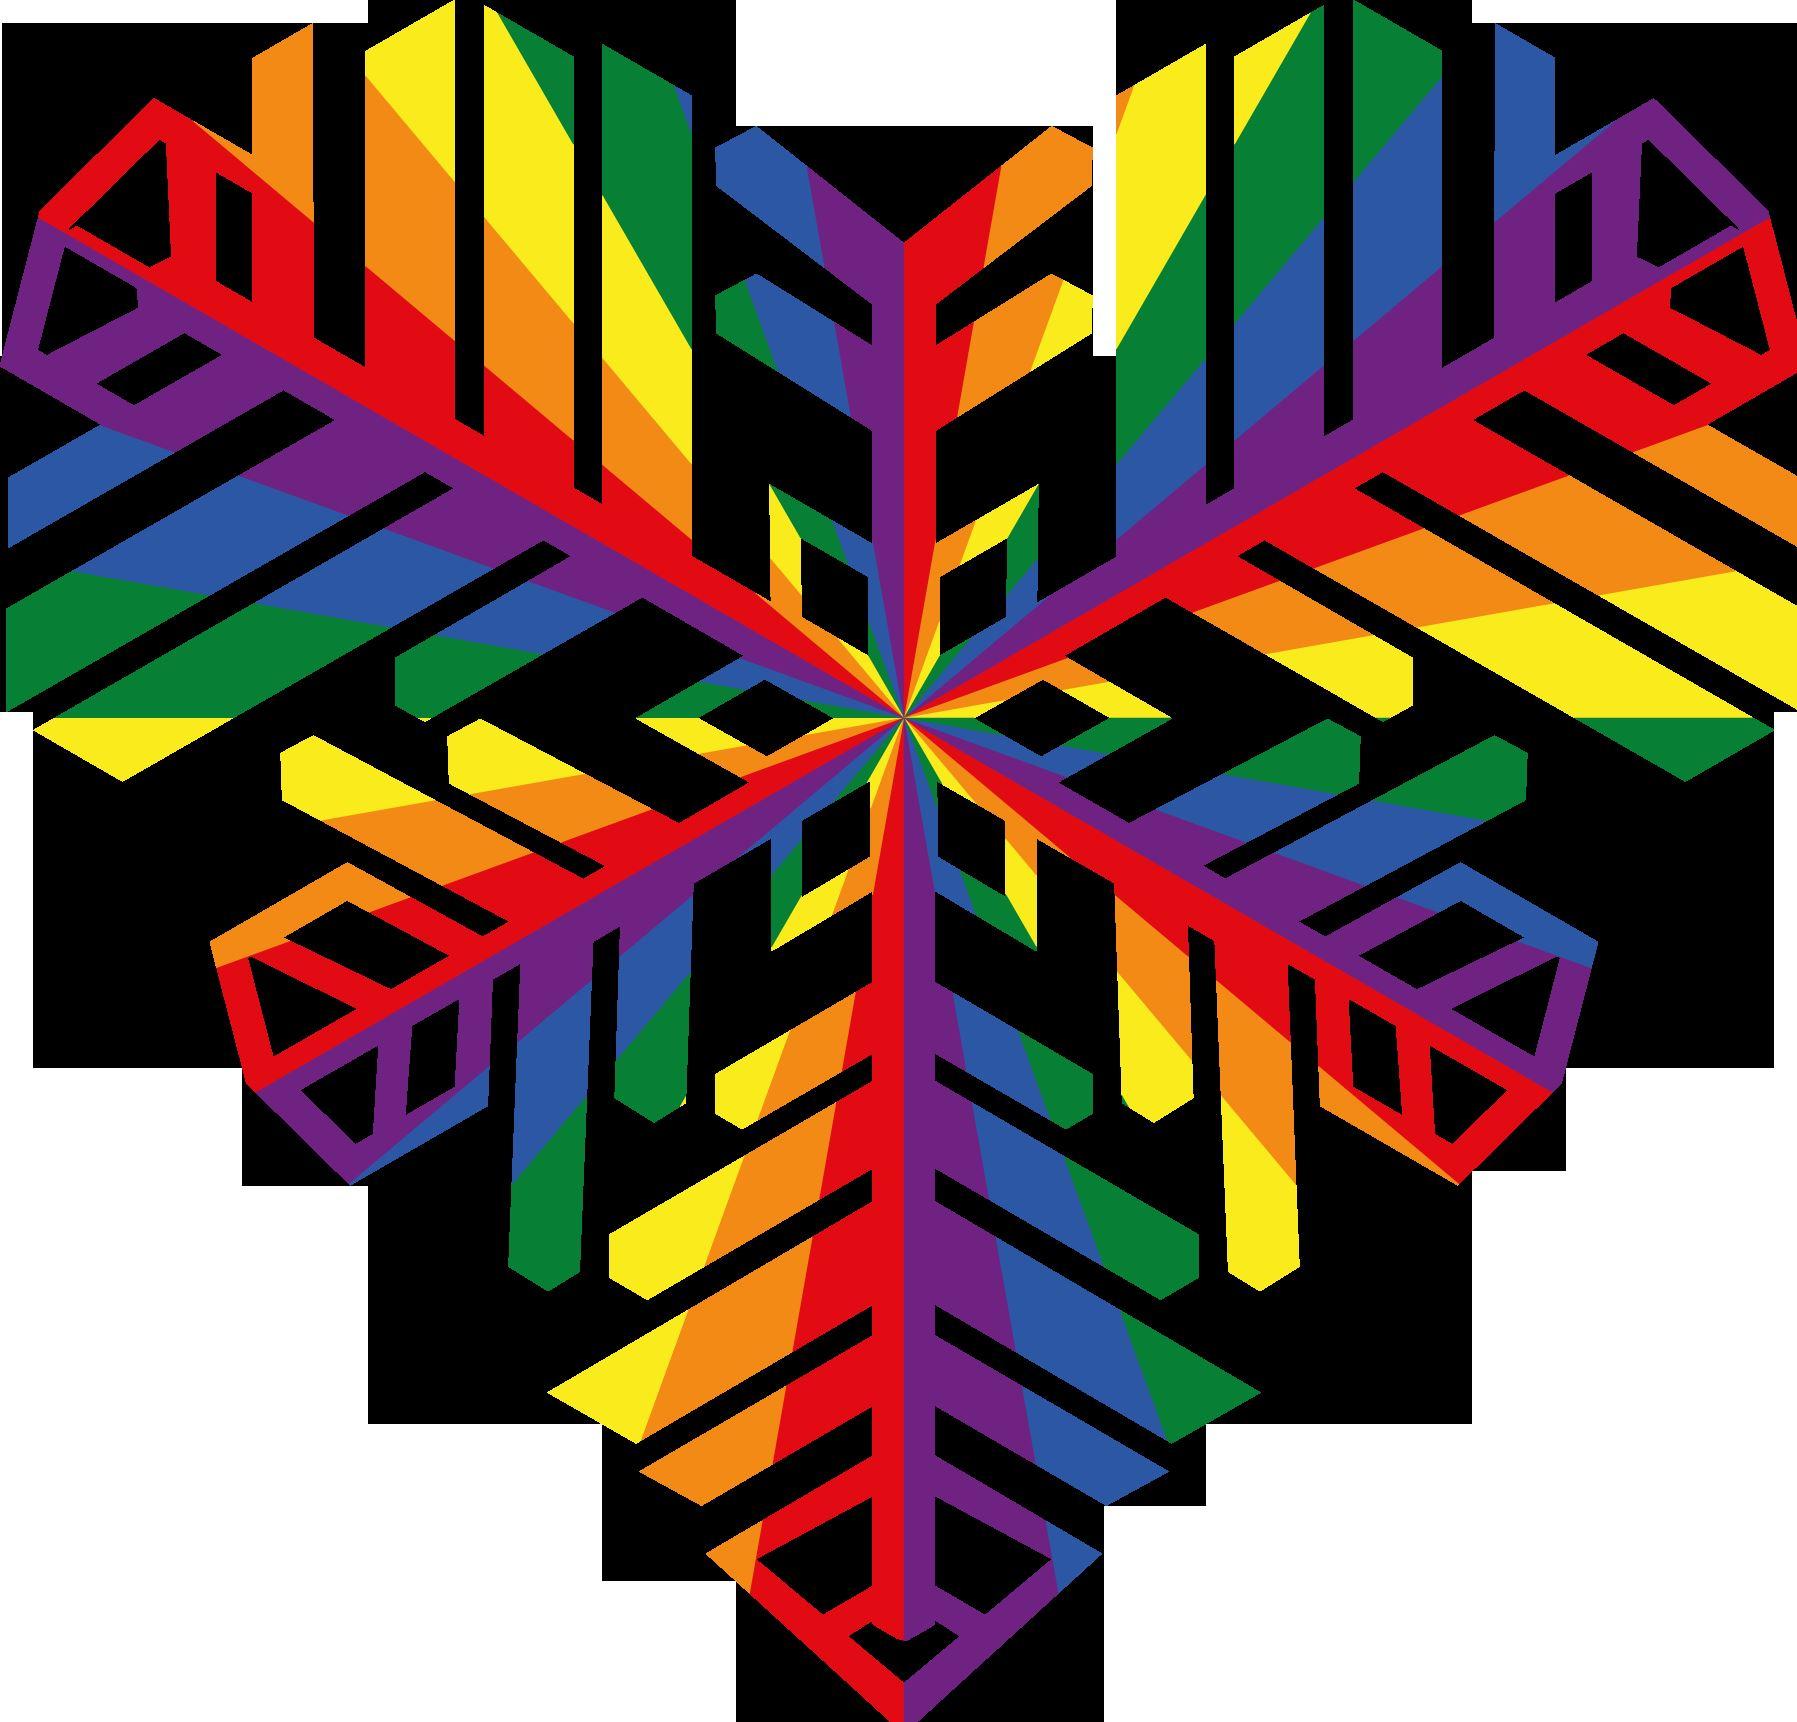 © RFSL Östersund., Östersunds snöhjärta i regnbågsfärger